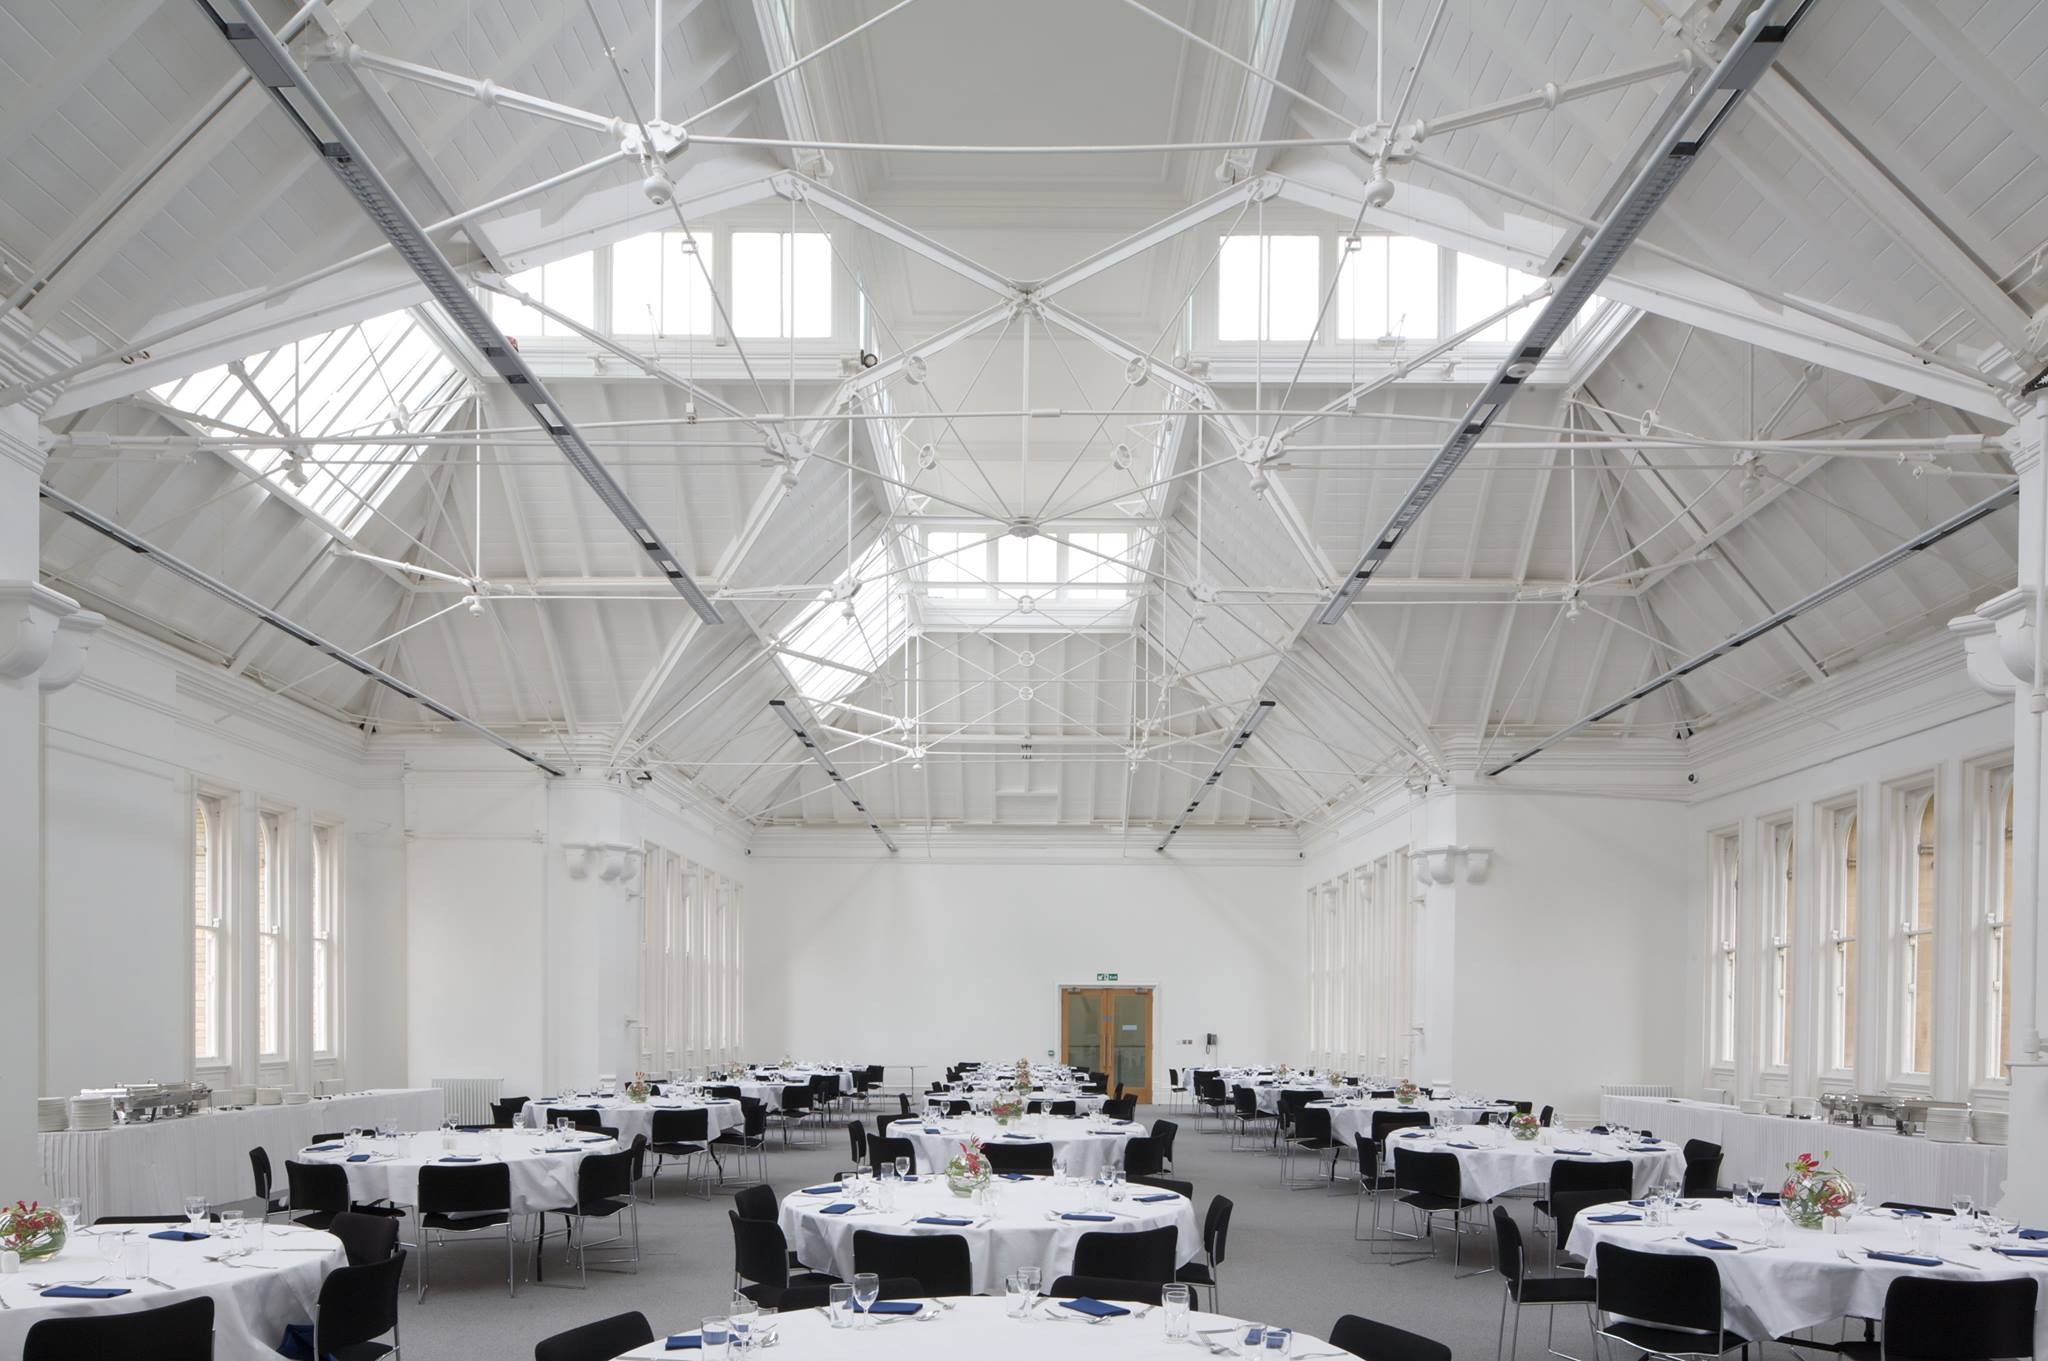 (similar heritage space in Northumberland, UK)